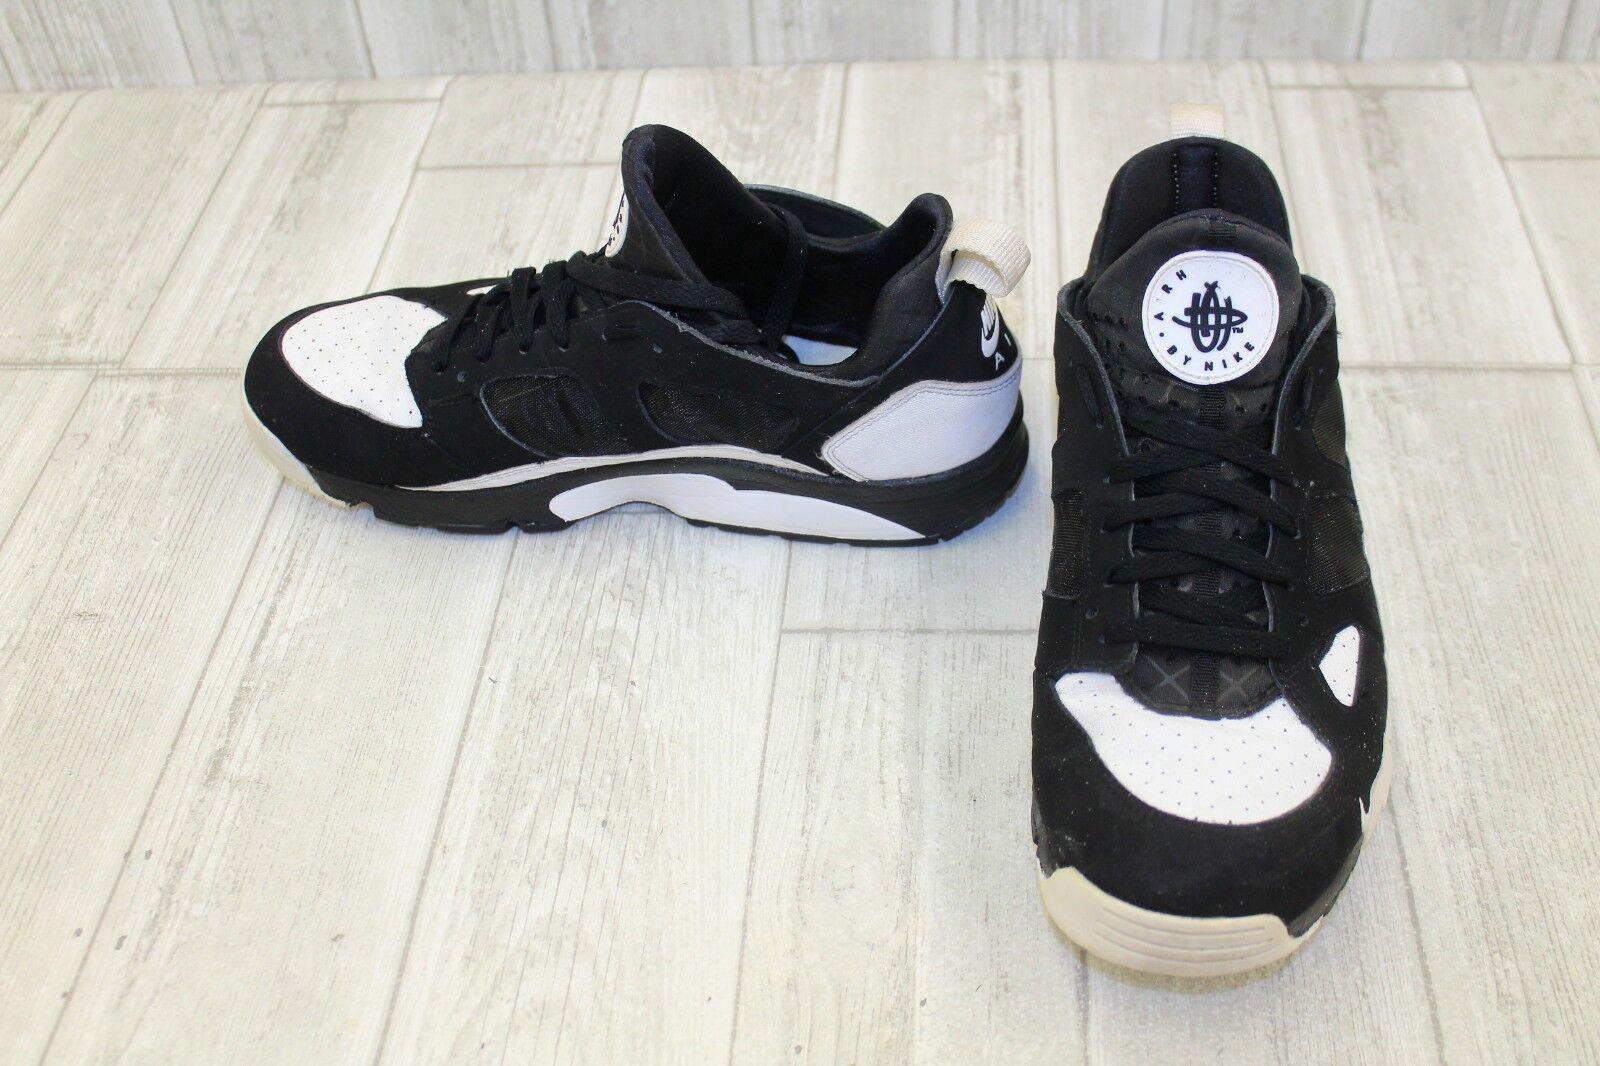 Nike Air Trainer Huarache Athletic Sneaker - - Sneaker Men's Size 11.5, Black/White 772f9a